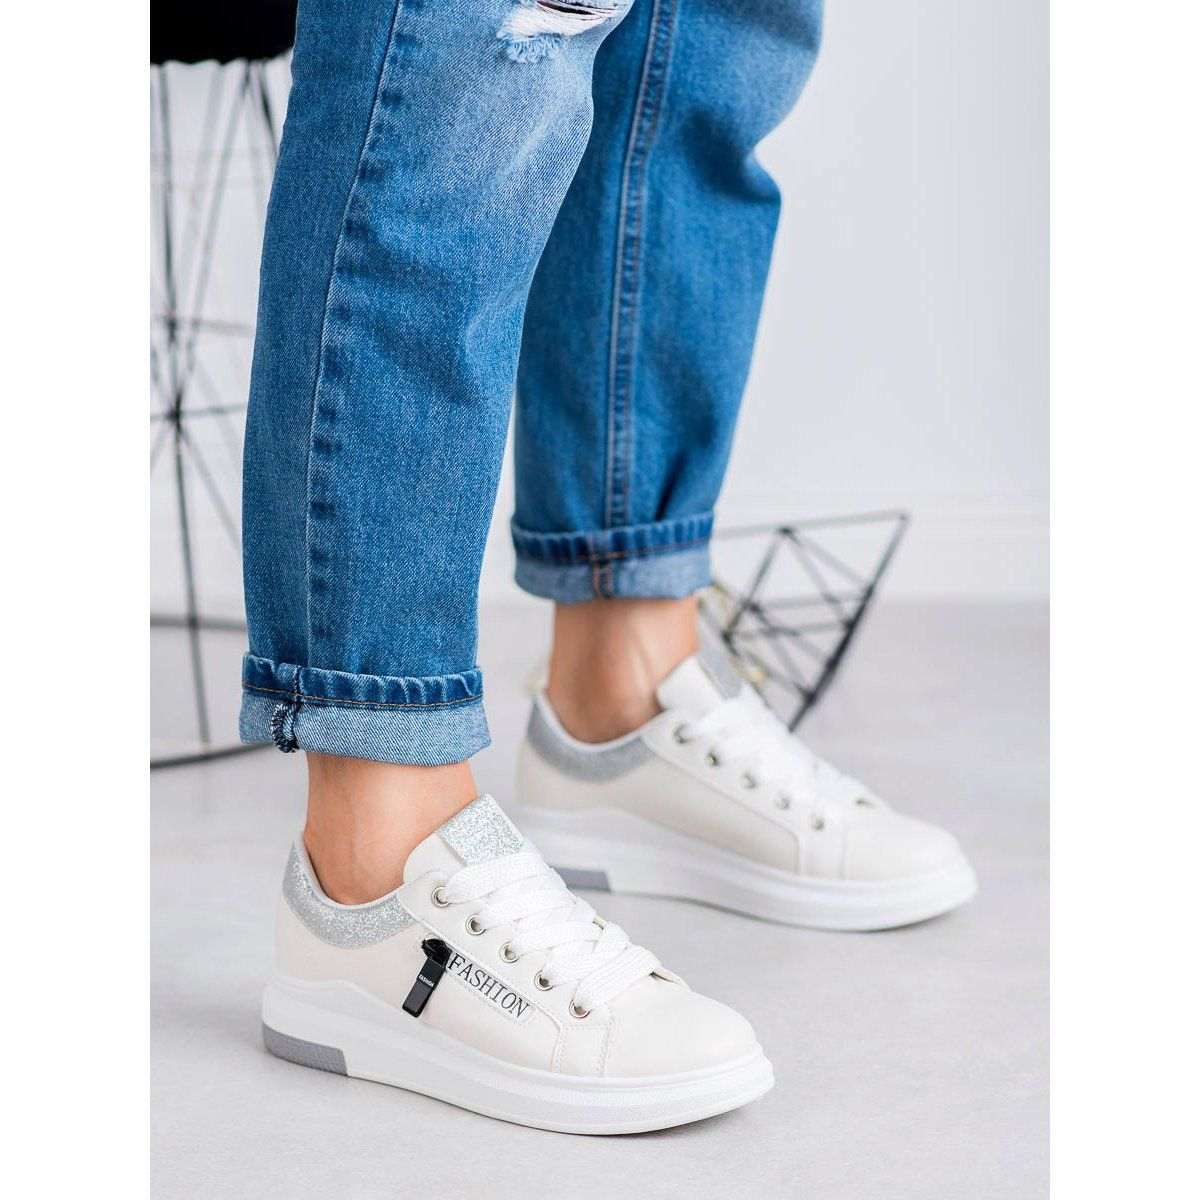 Shelovet Buty Sportowe Fashion Biale Shoes White Sneaker Sneakers